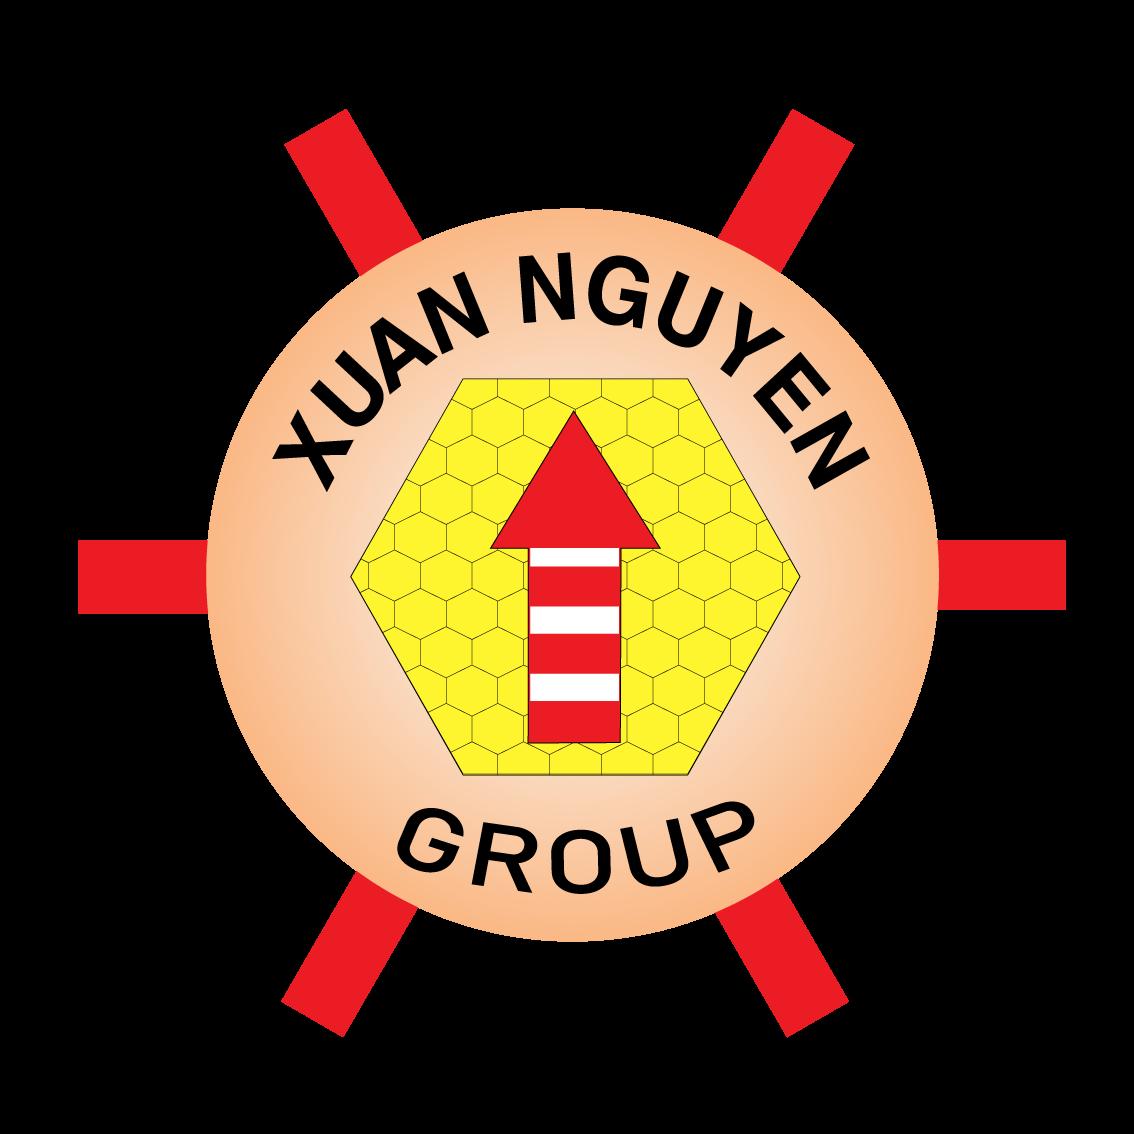 Xuan Nguyen Honey